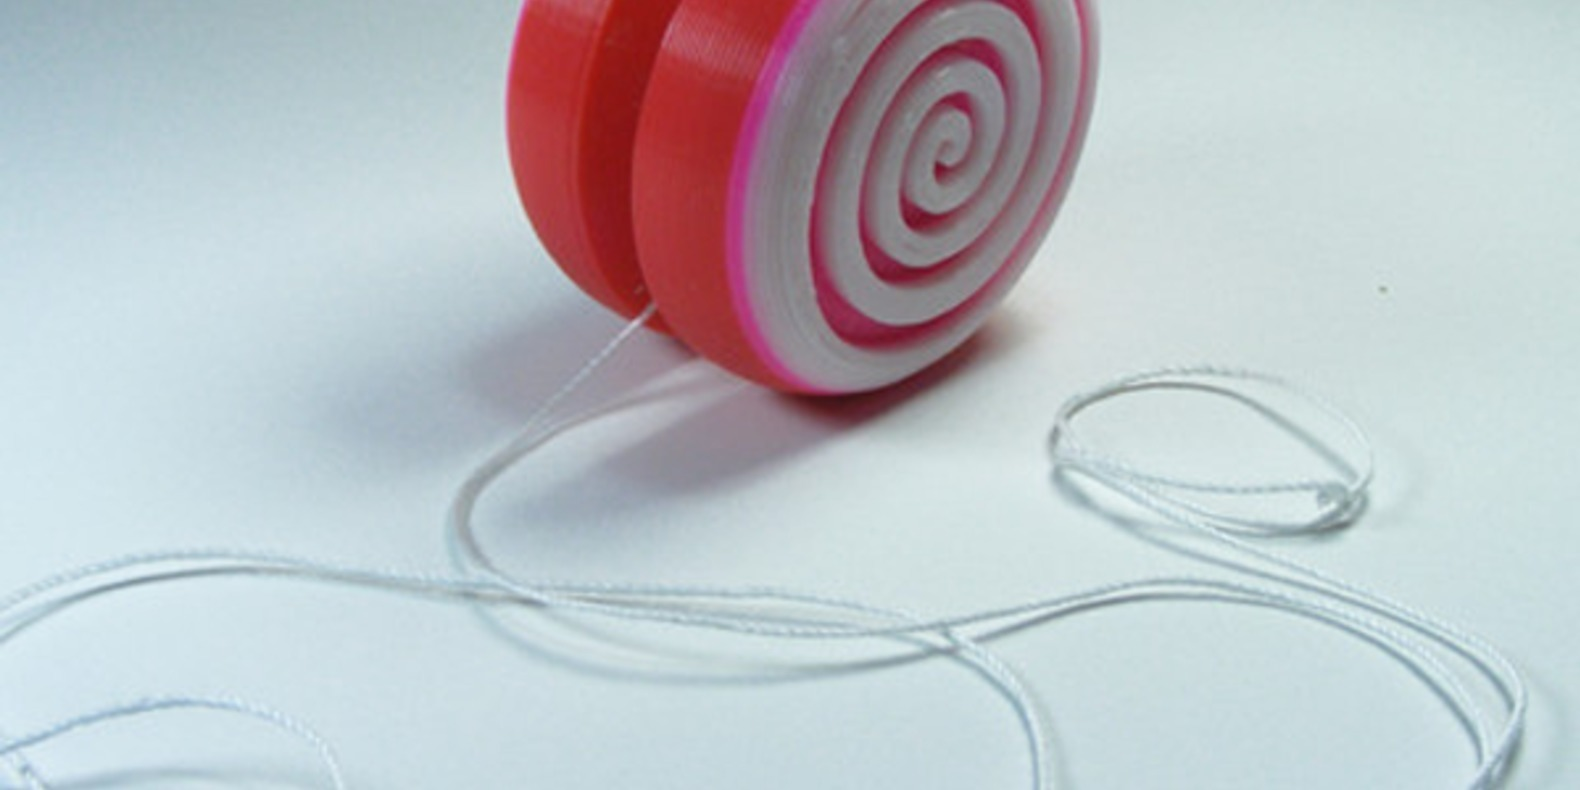 20.YoYo-Platonik jouets imprimés en 3D